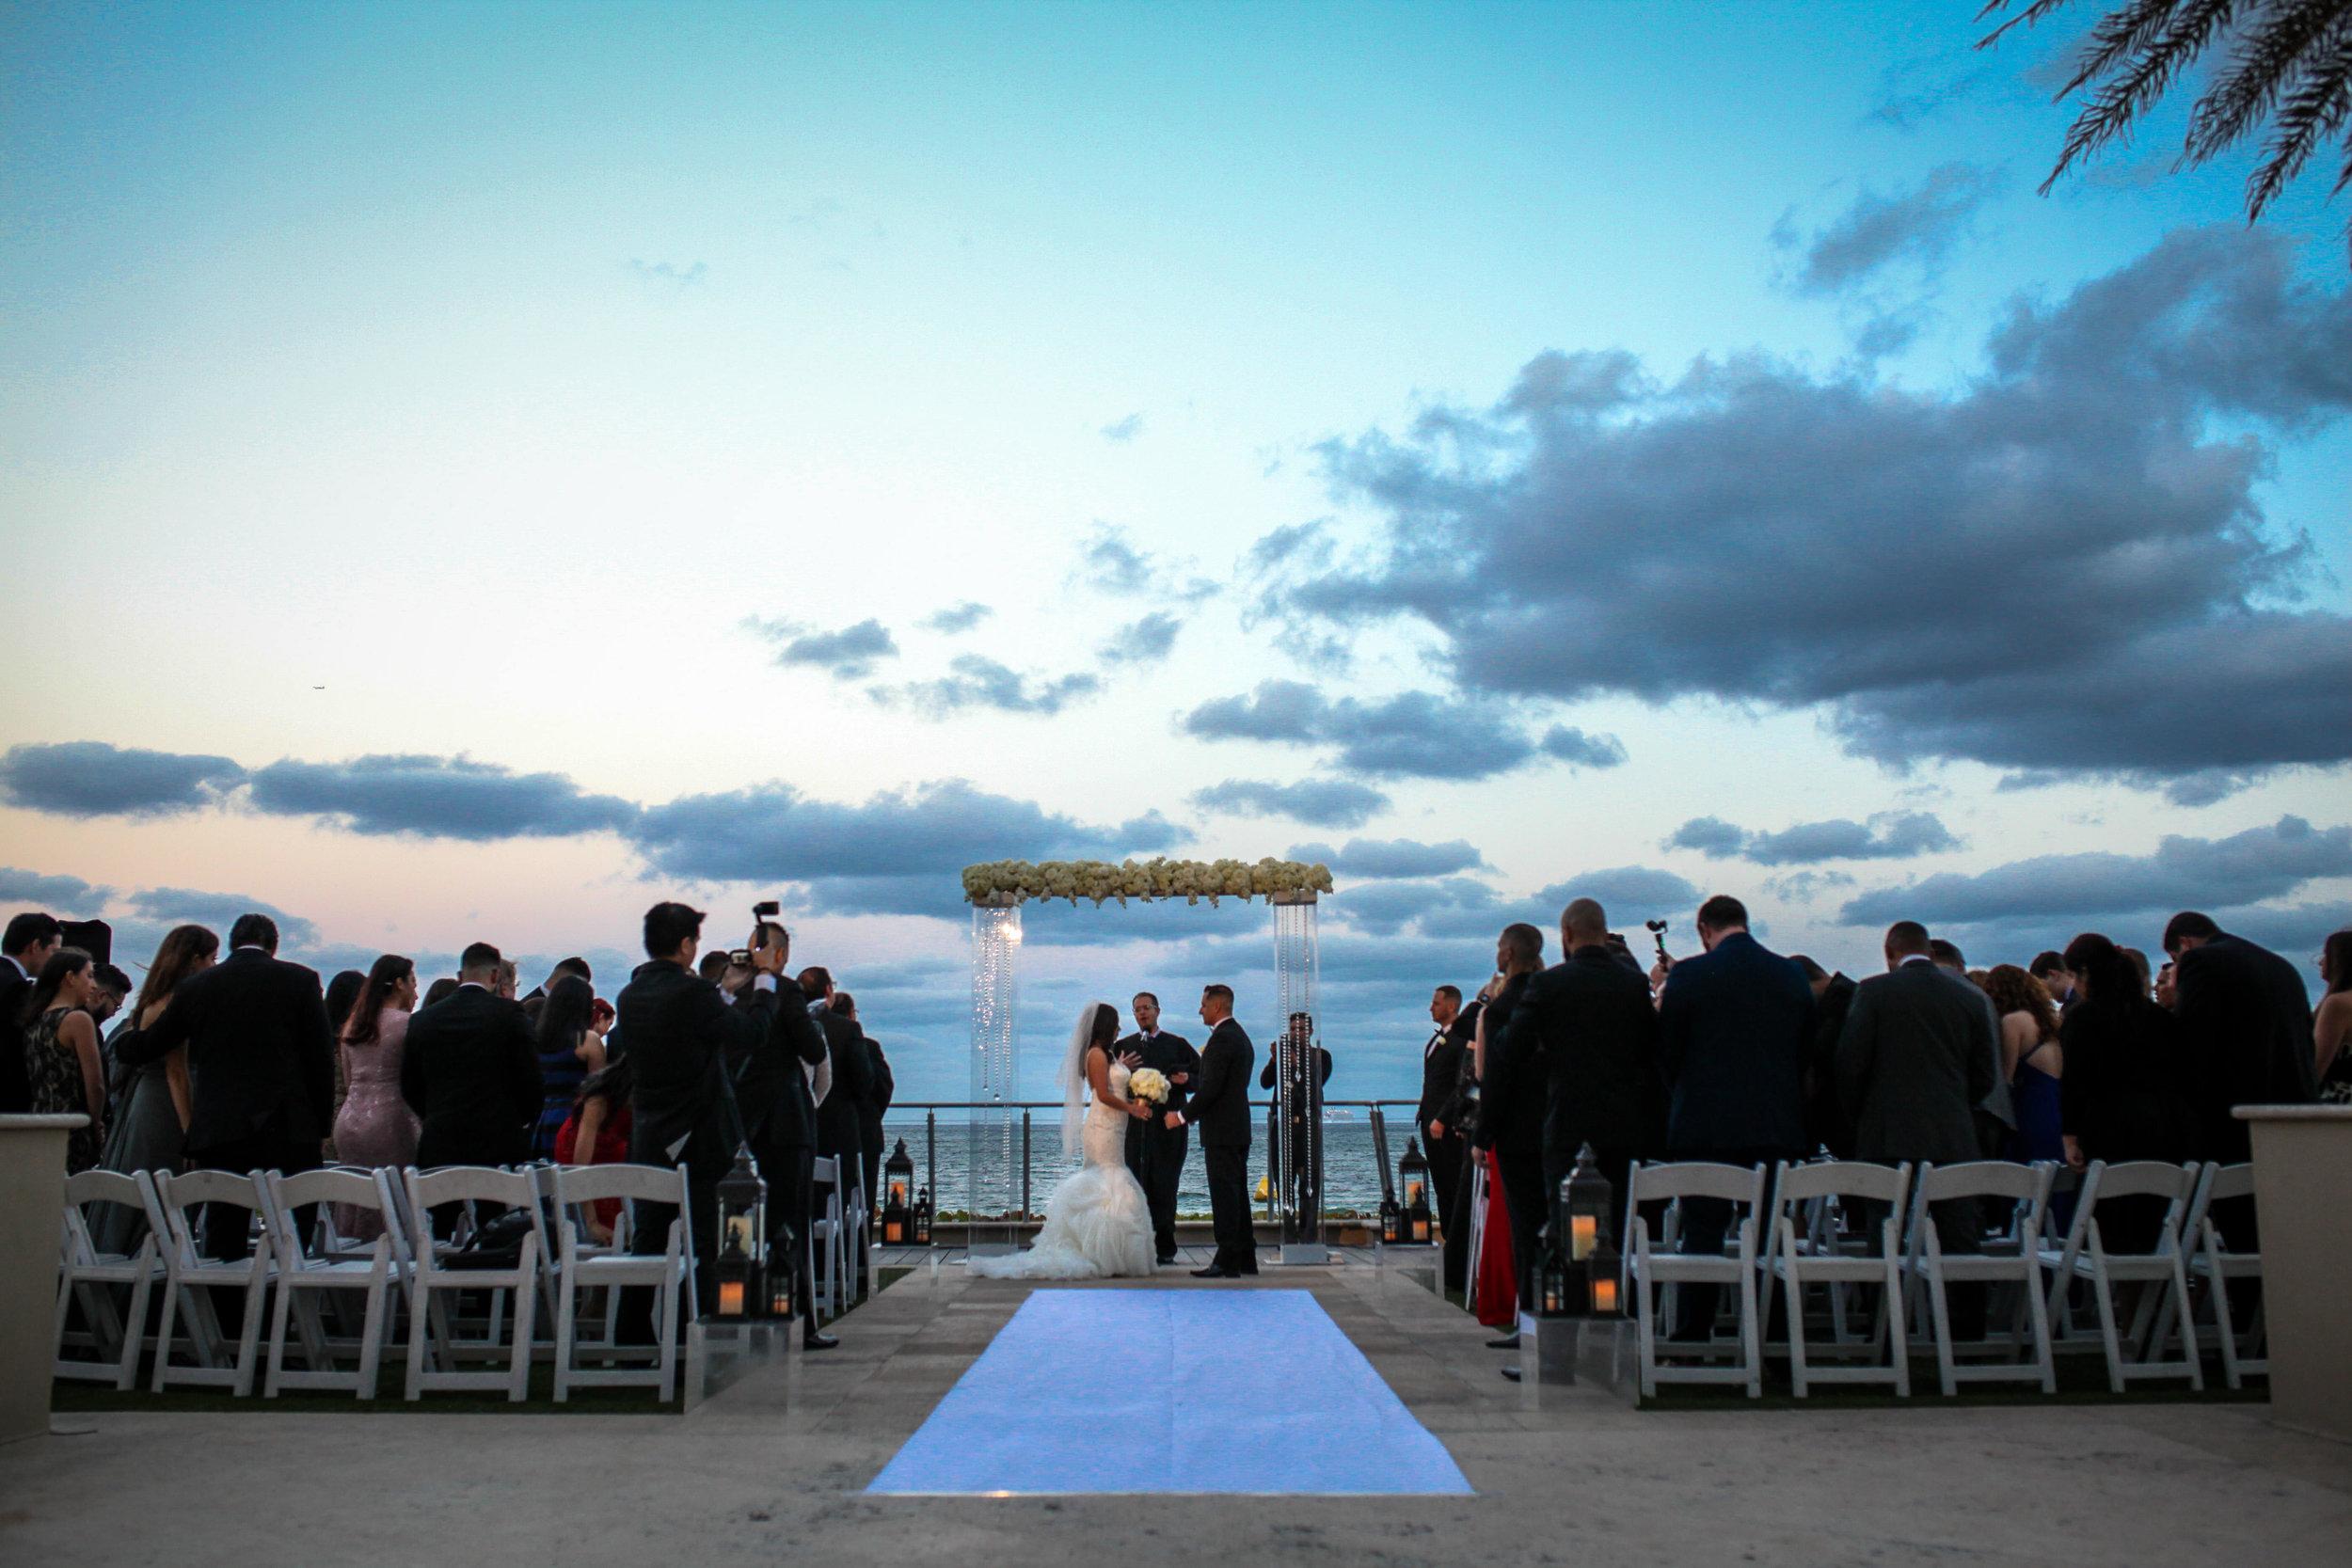 ft-lauderdale-marriott-harbor-beach-wedding-2483 copy.jpg